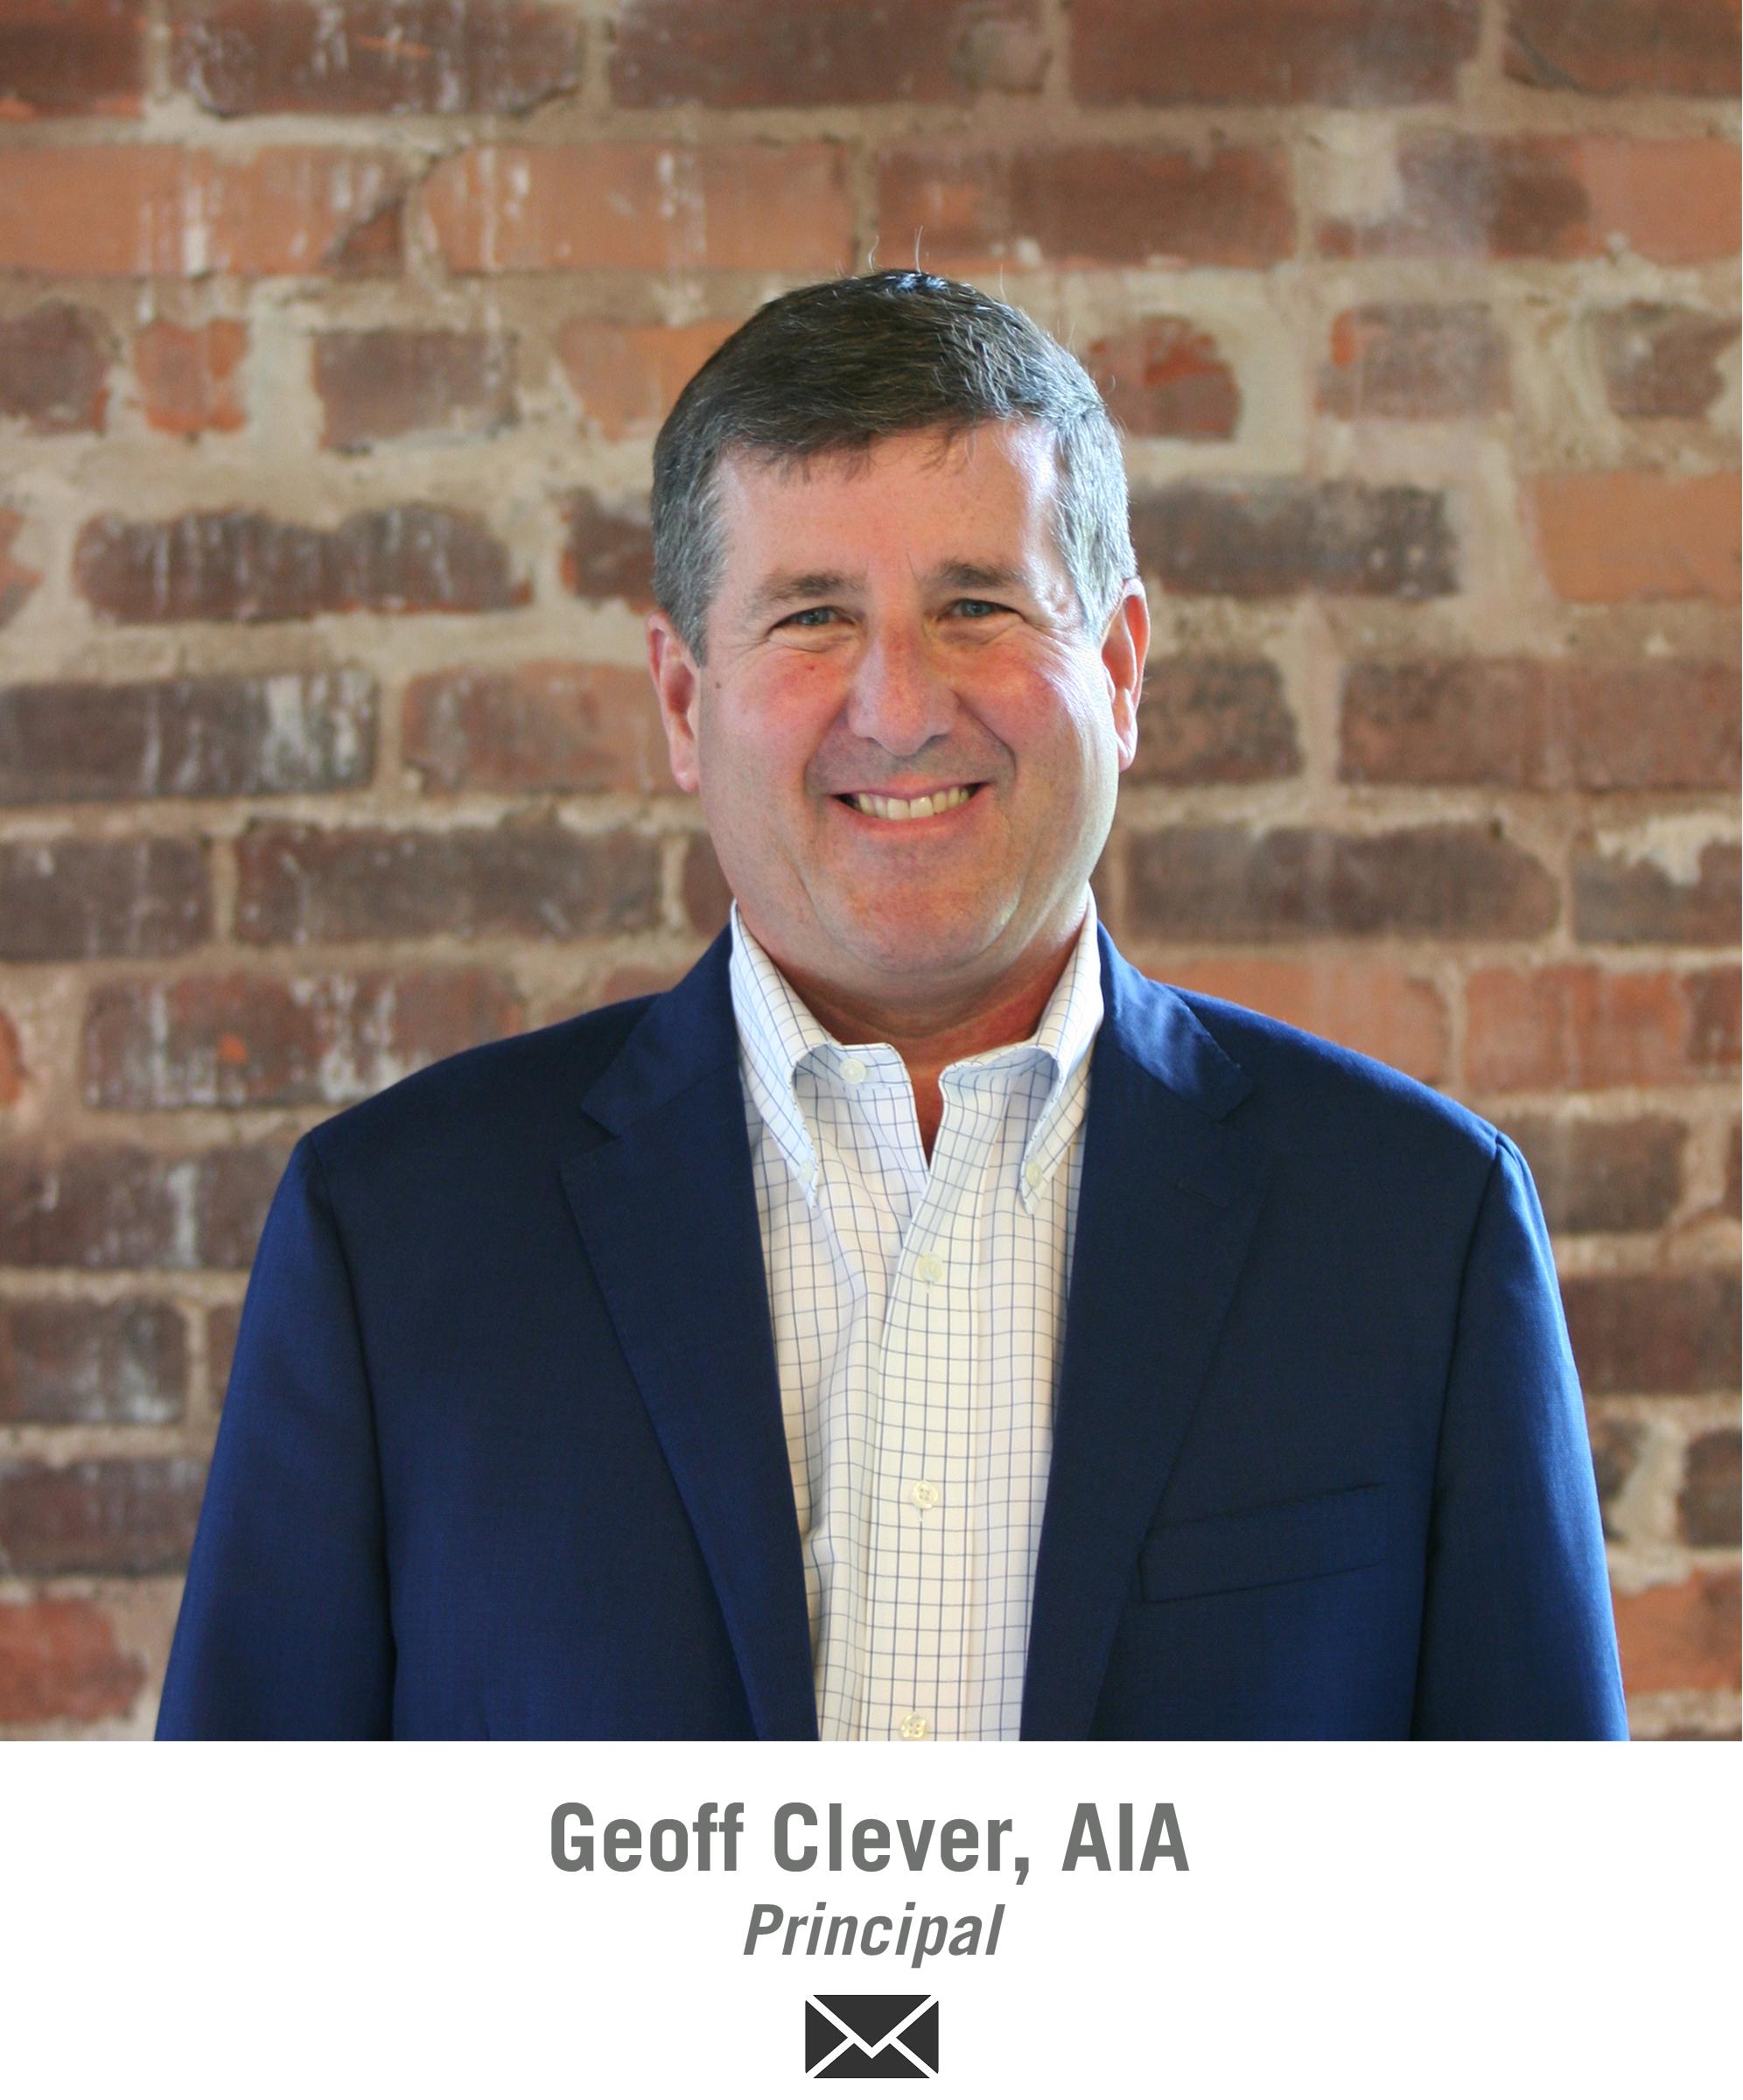 Geoff Clever.jpg